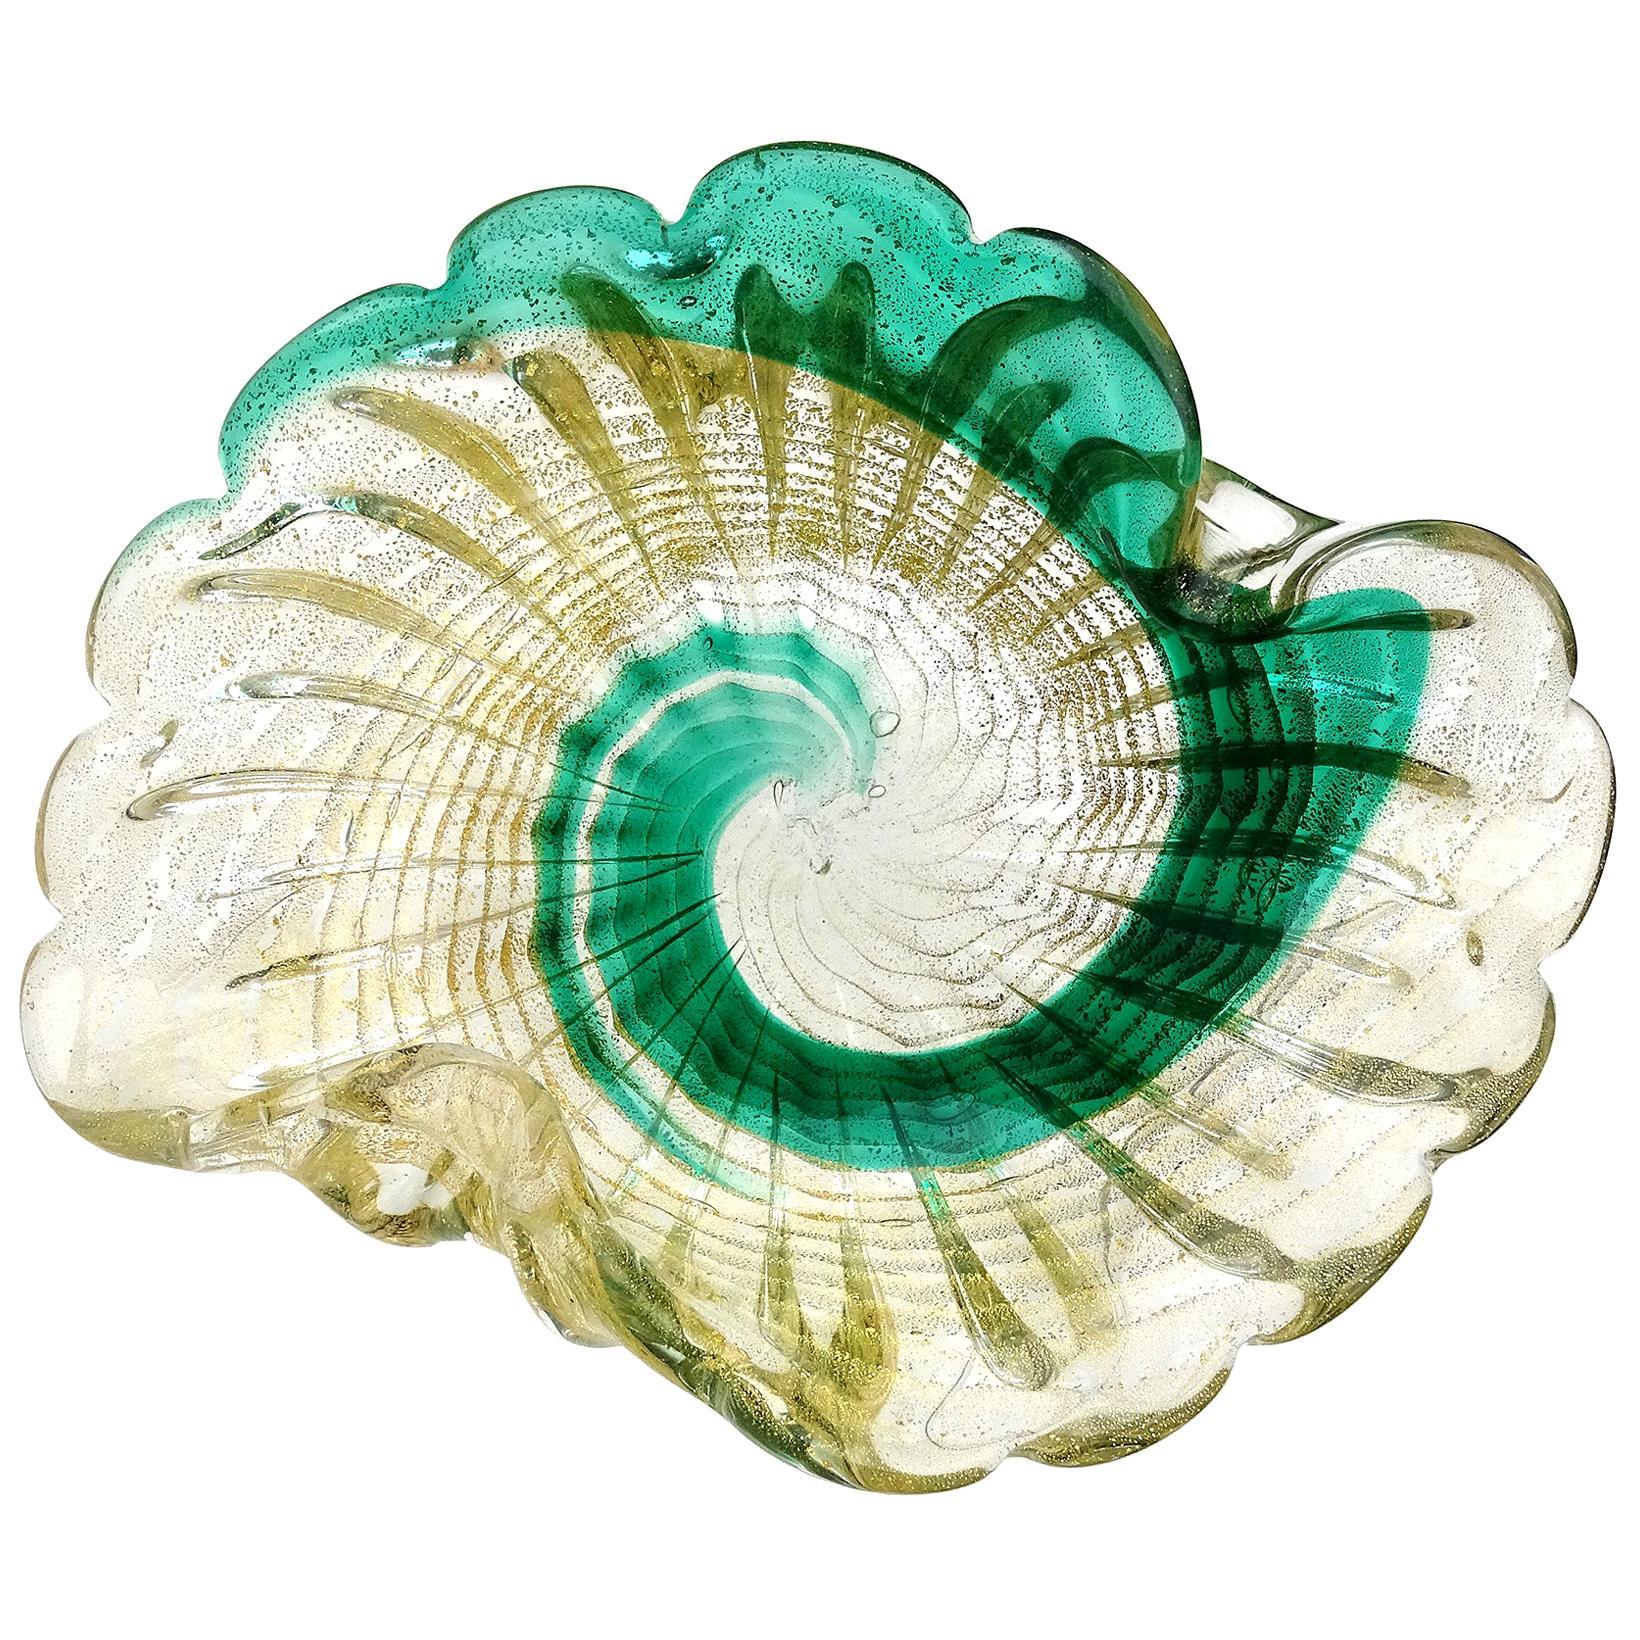 Murano Vintage Green Swirl Paint Stroke Gold Flecks Italian Art Glass Bowl Dish